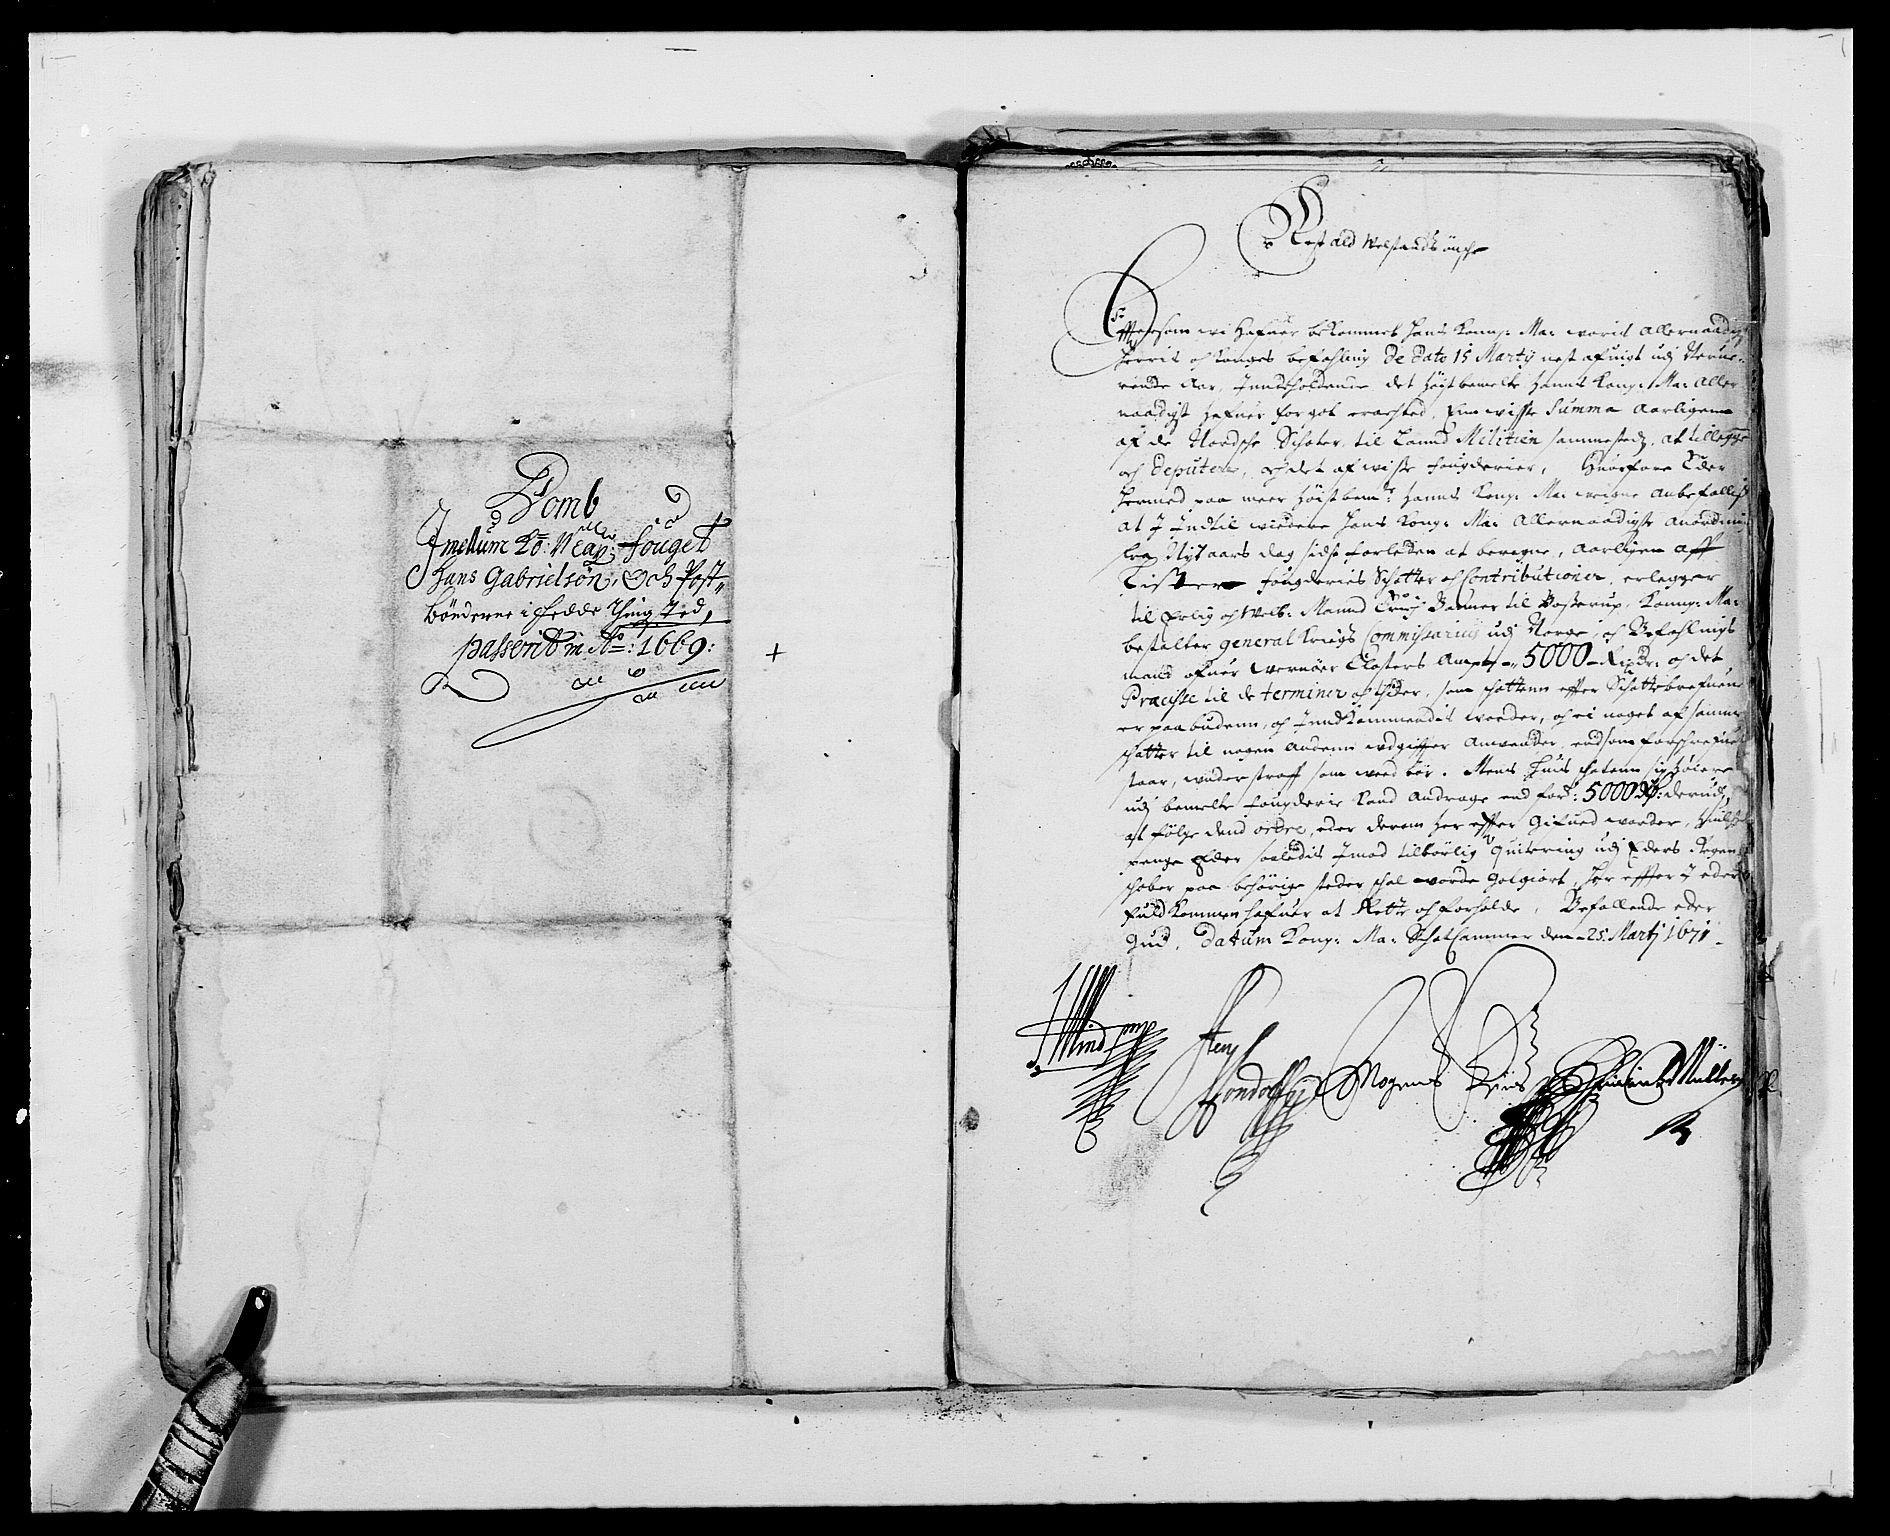 RA, Rentekammeret inntil 1814, Reviderte regnskaper, Fogderegnskap, R41/L2527: Fogderegnskap Lista, 1672, s. 223